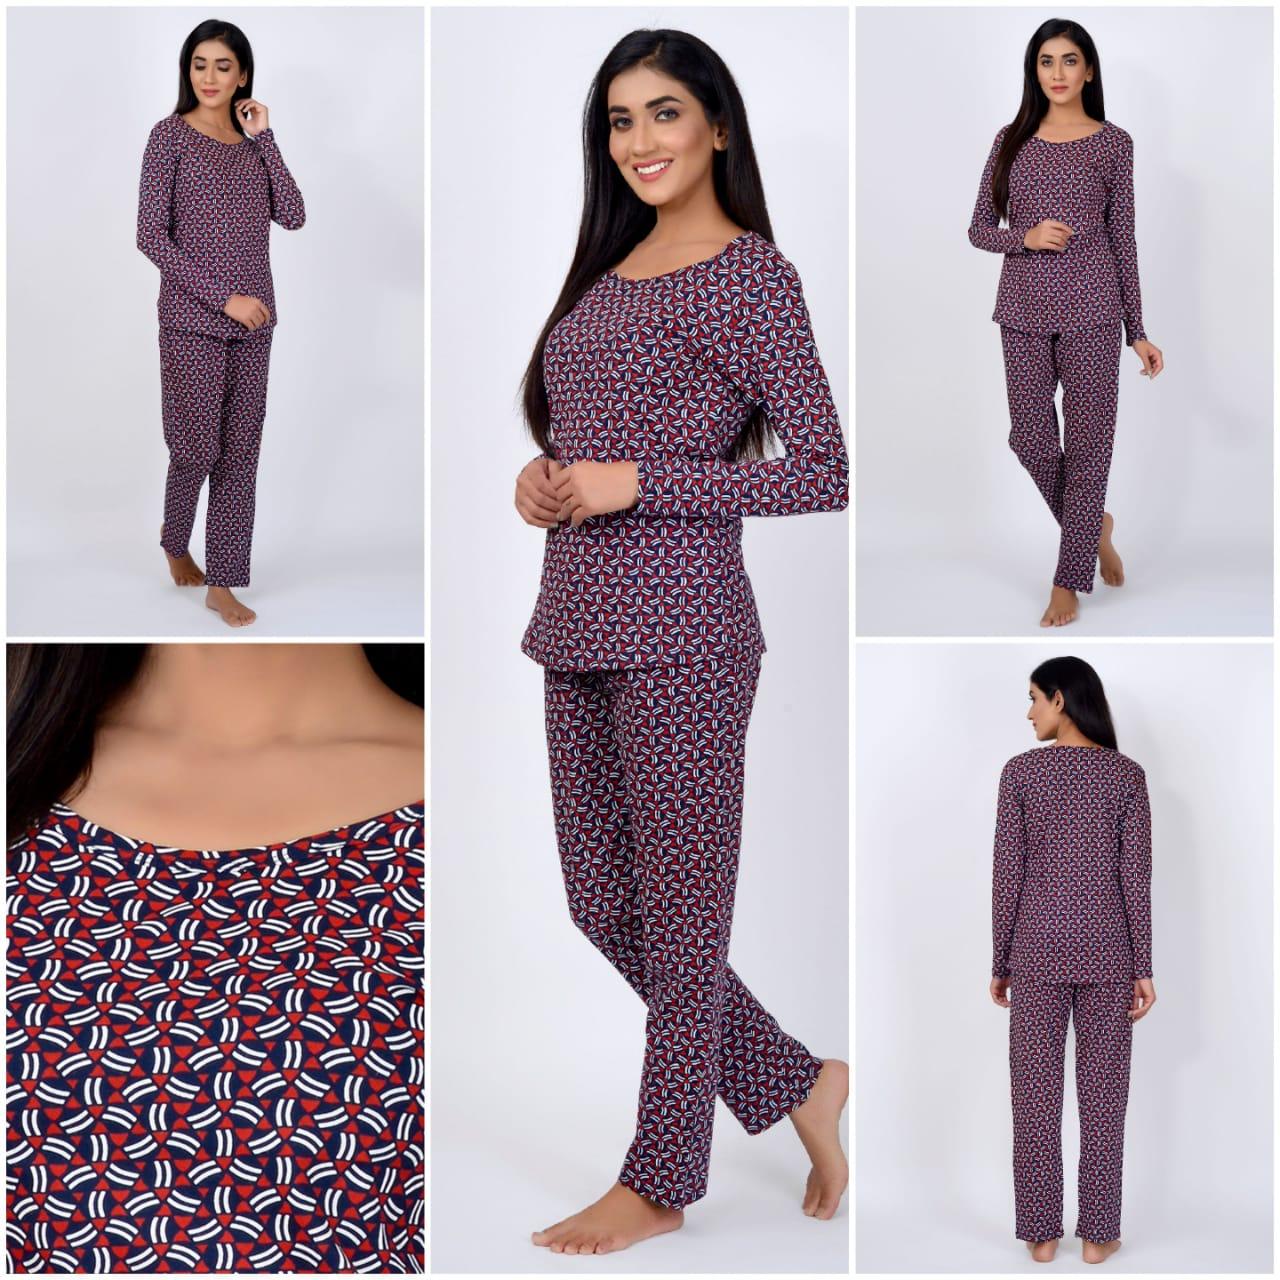 Avashya Premium Night Wear Vol 3 Wholesale Catalog 6 Pcs 9 1 - Avashya Premium Night Wear Vol 3 Wholesale Catalog 6 Pcs